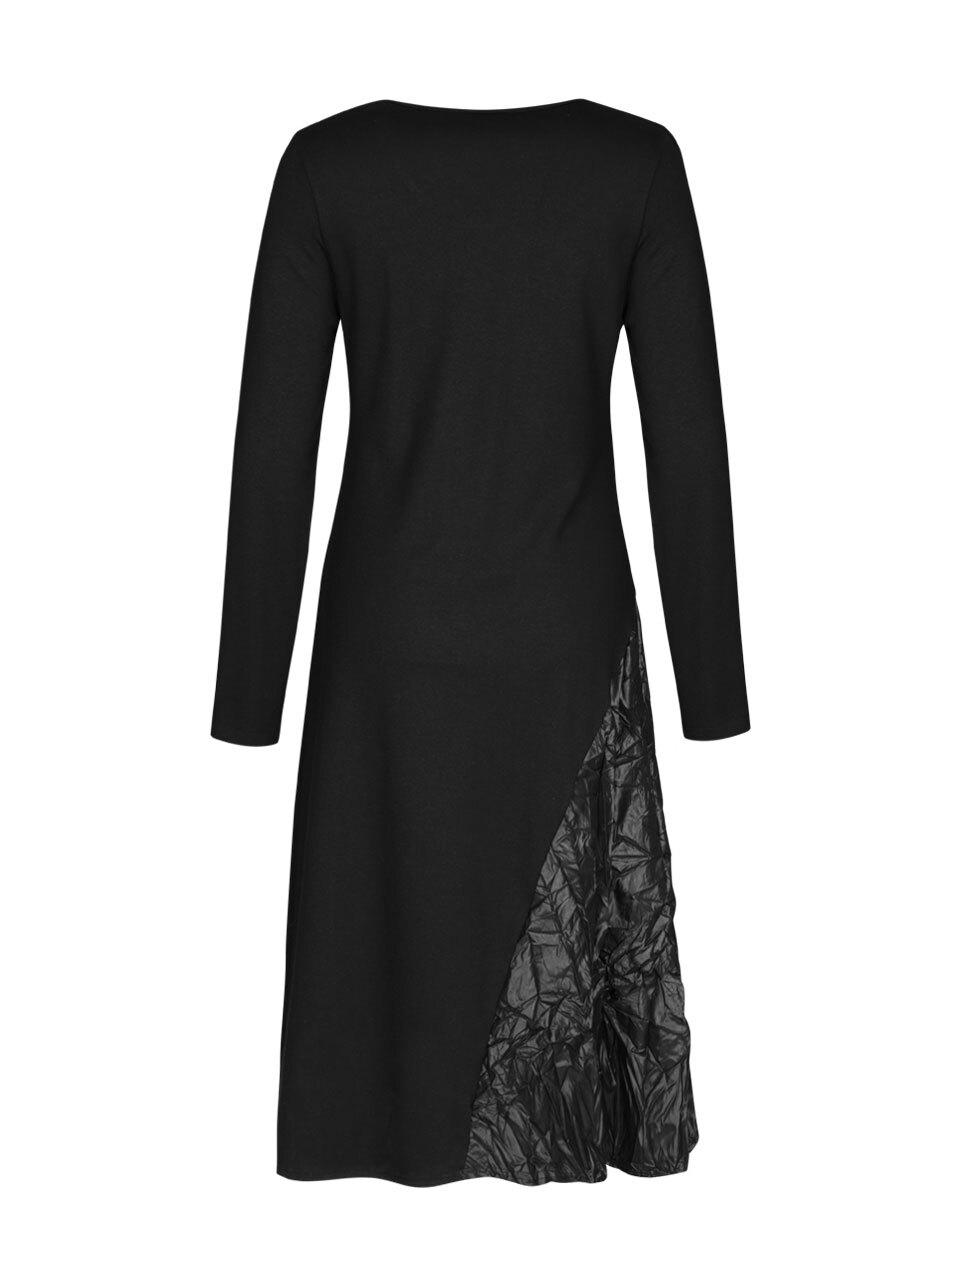 EverSassy By Dolcezza: Asymmetrical Pocket Multi-Media Black Dress